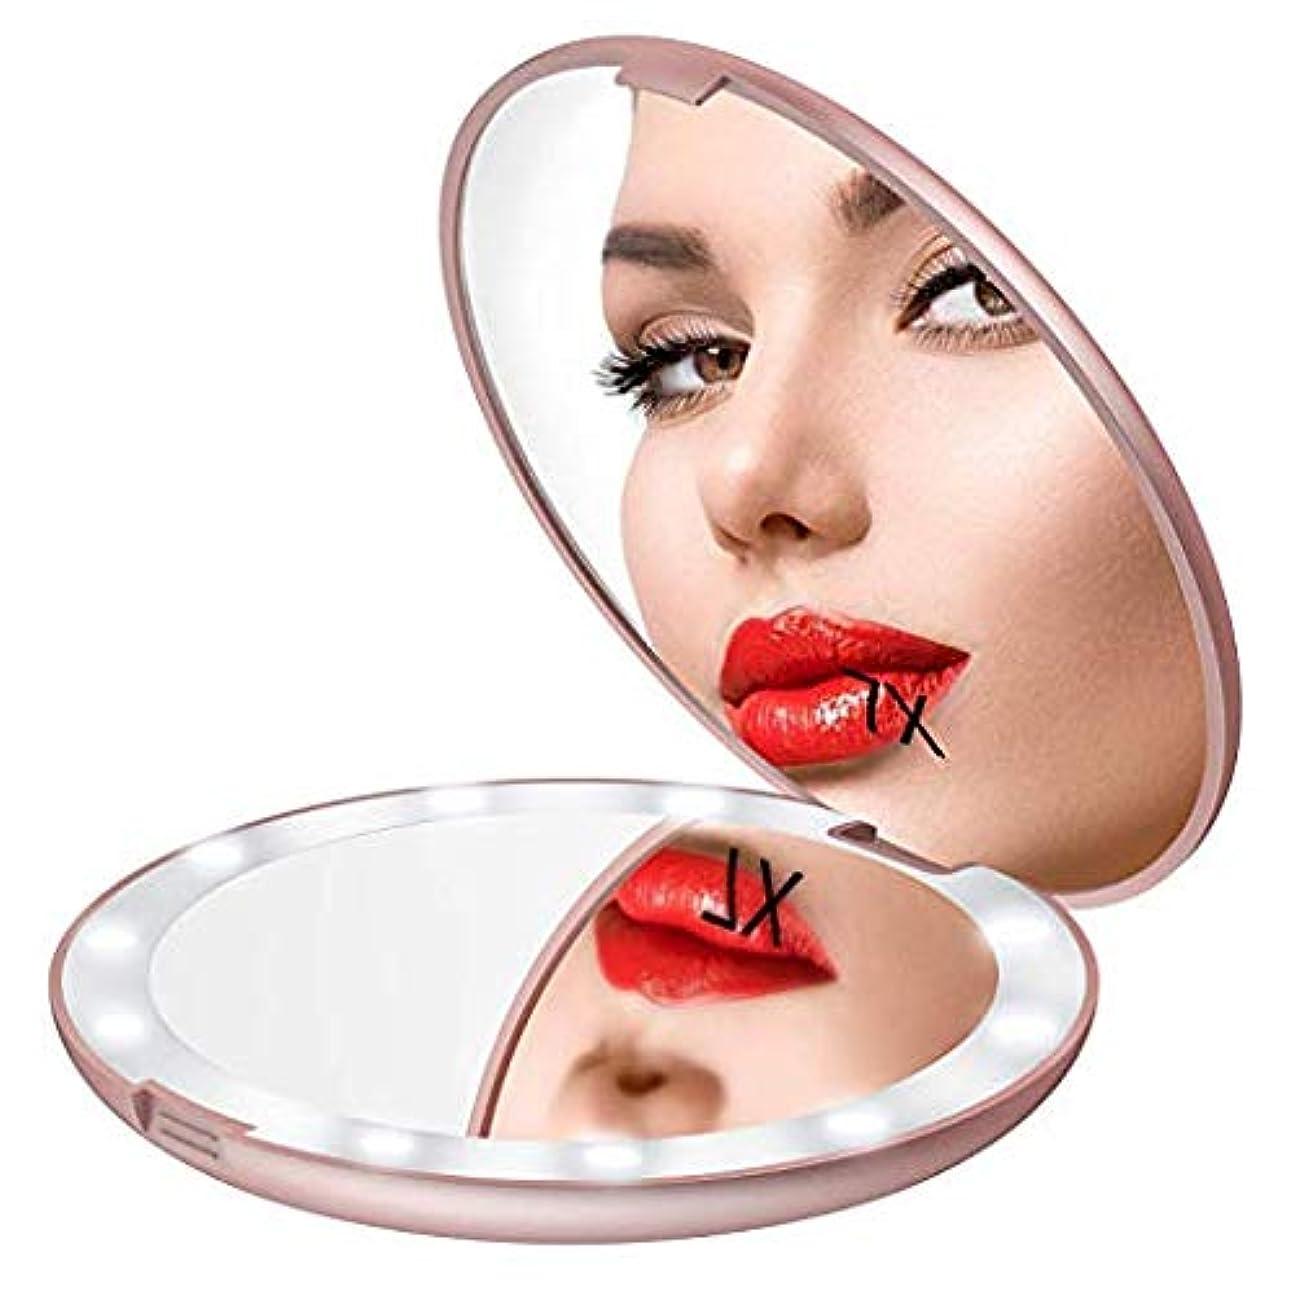 Gospire 化粧鏡 7倍拡大鏡 携帯ミラー 化粧ミラー LEDライト 手鏡 折りたたみ式 コンパクト 角度調整可 (ピンクゴールド)